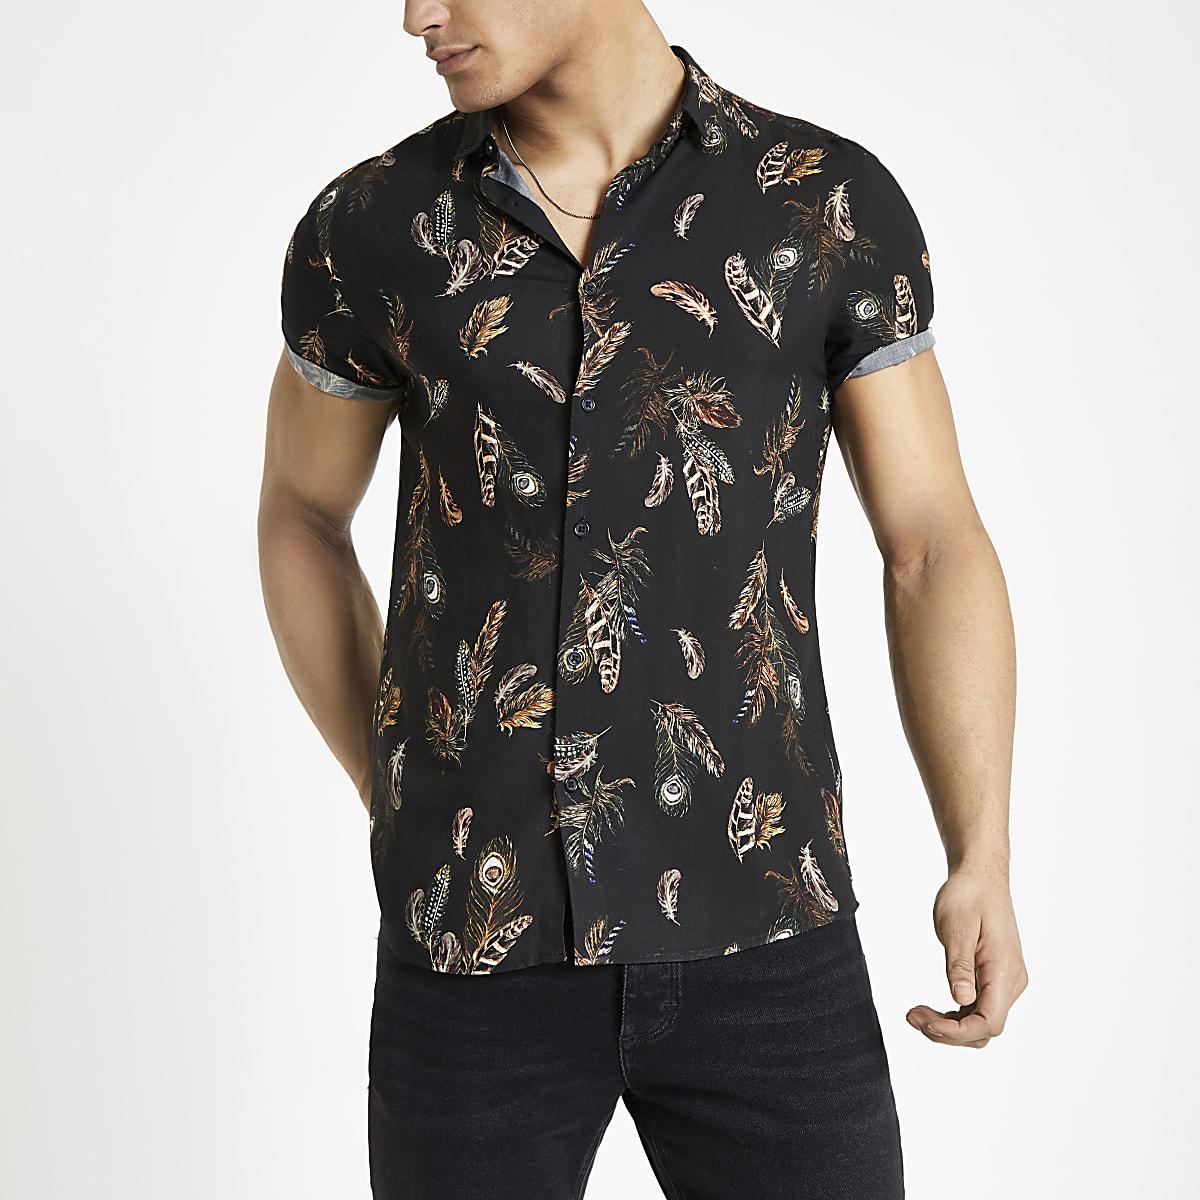 Overhemd Zwart Korte Mouw.Zwart Overhemd Met Korte Mouwen En Verenprint Overhemden Met Korte